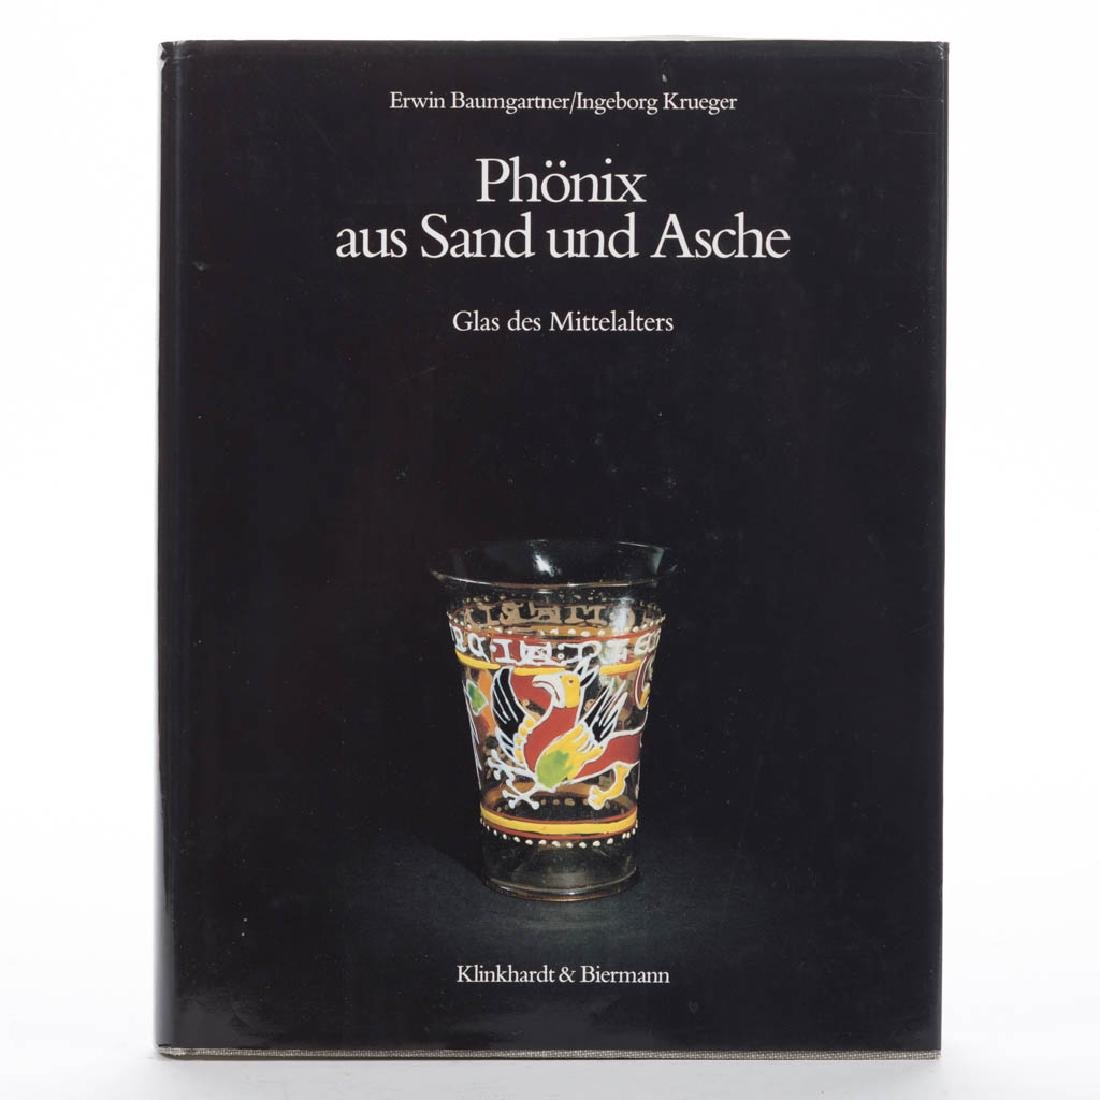 GERMAN GLASS REFERENCE VOLUME